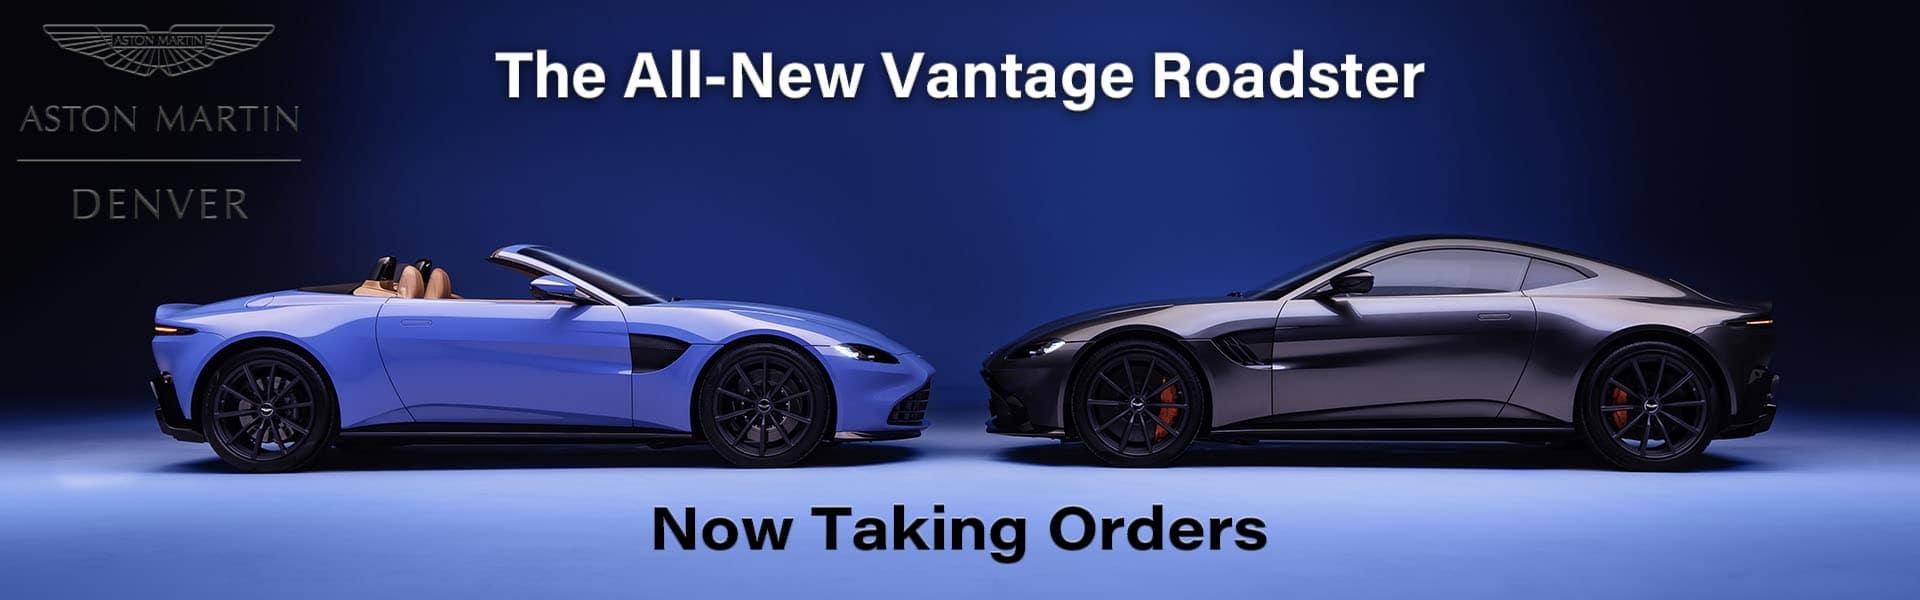 All-New Aston Martin Vantage Roadster